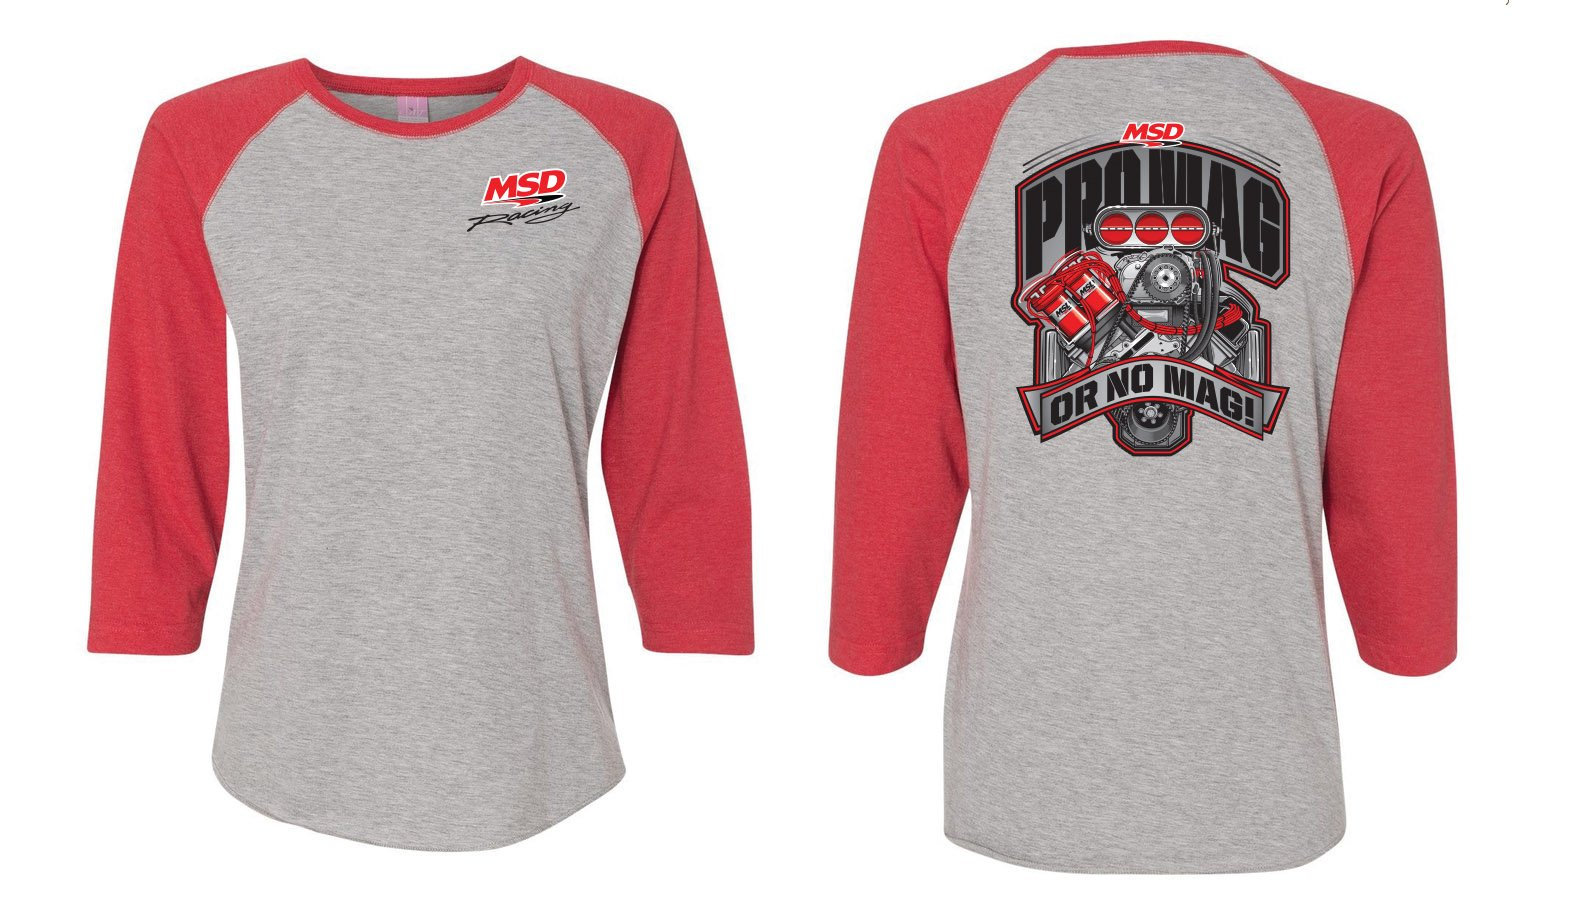 95227 - MSD Racing, Jersey Baseball T-Shirt, Large Image